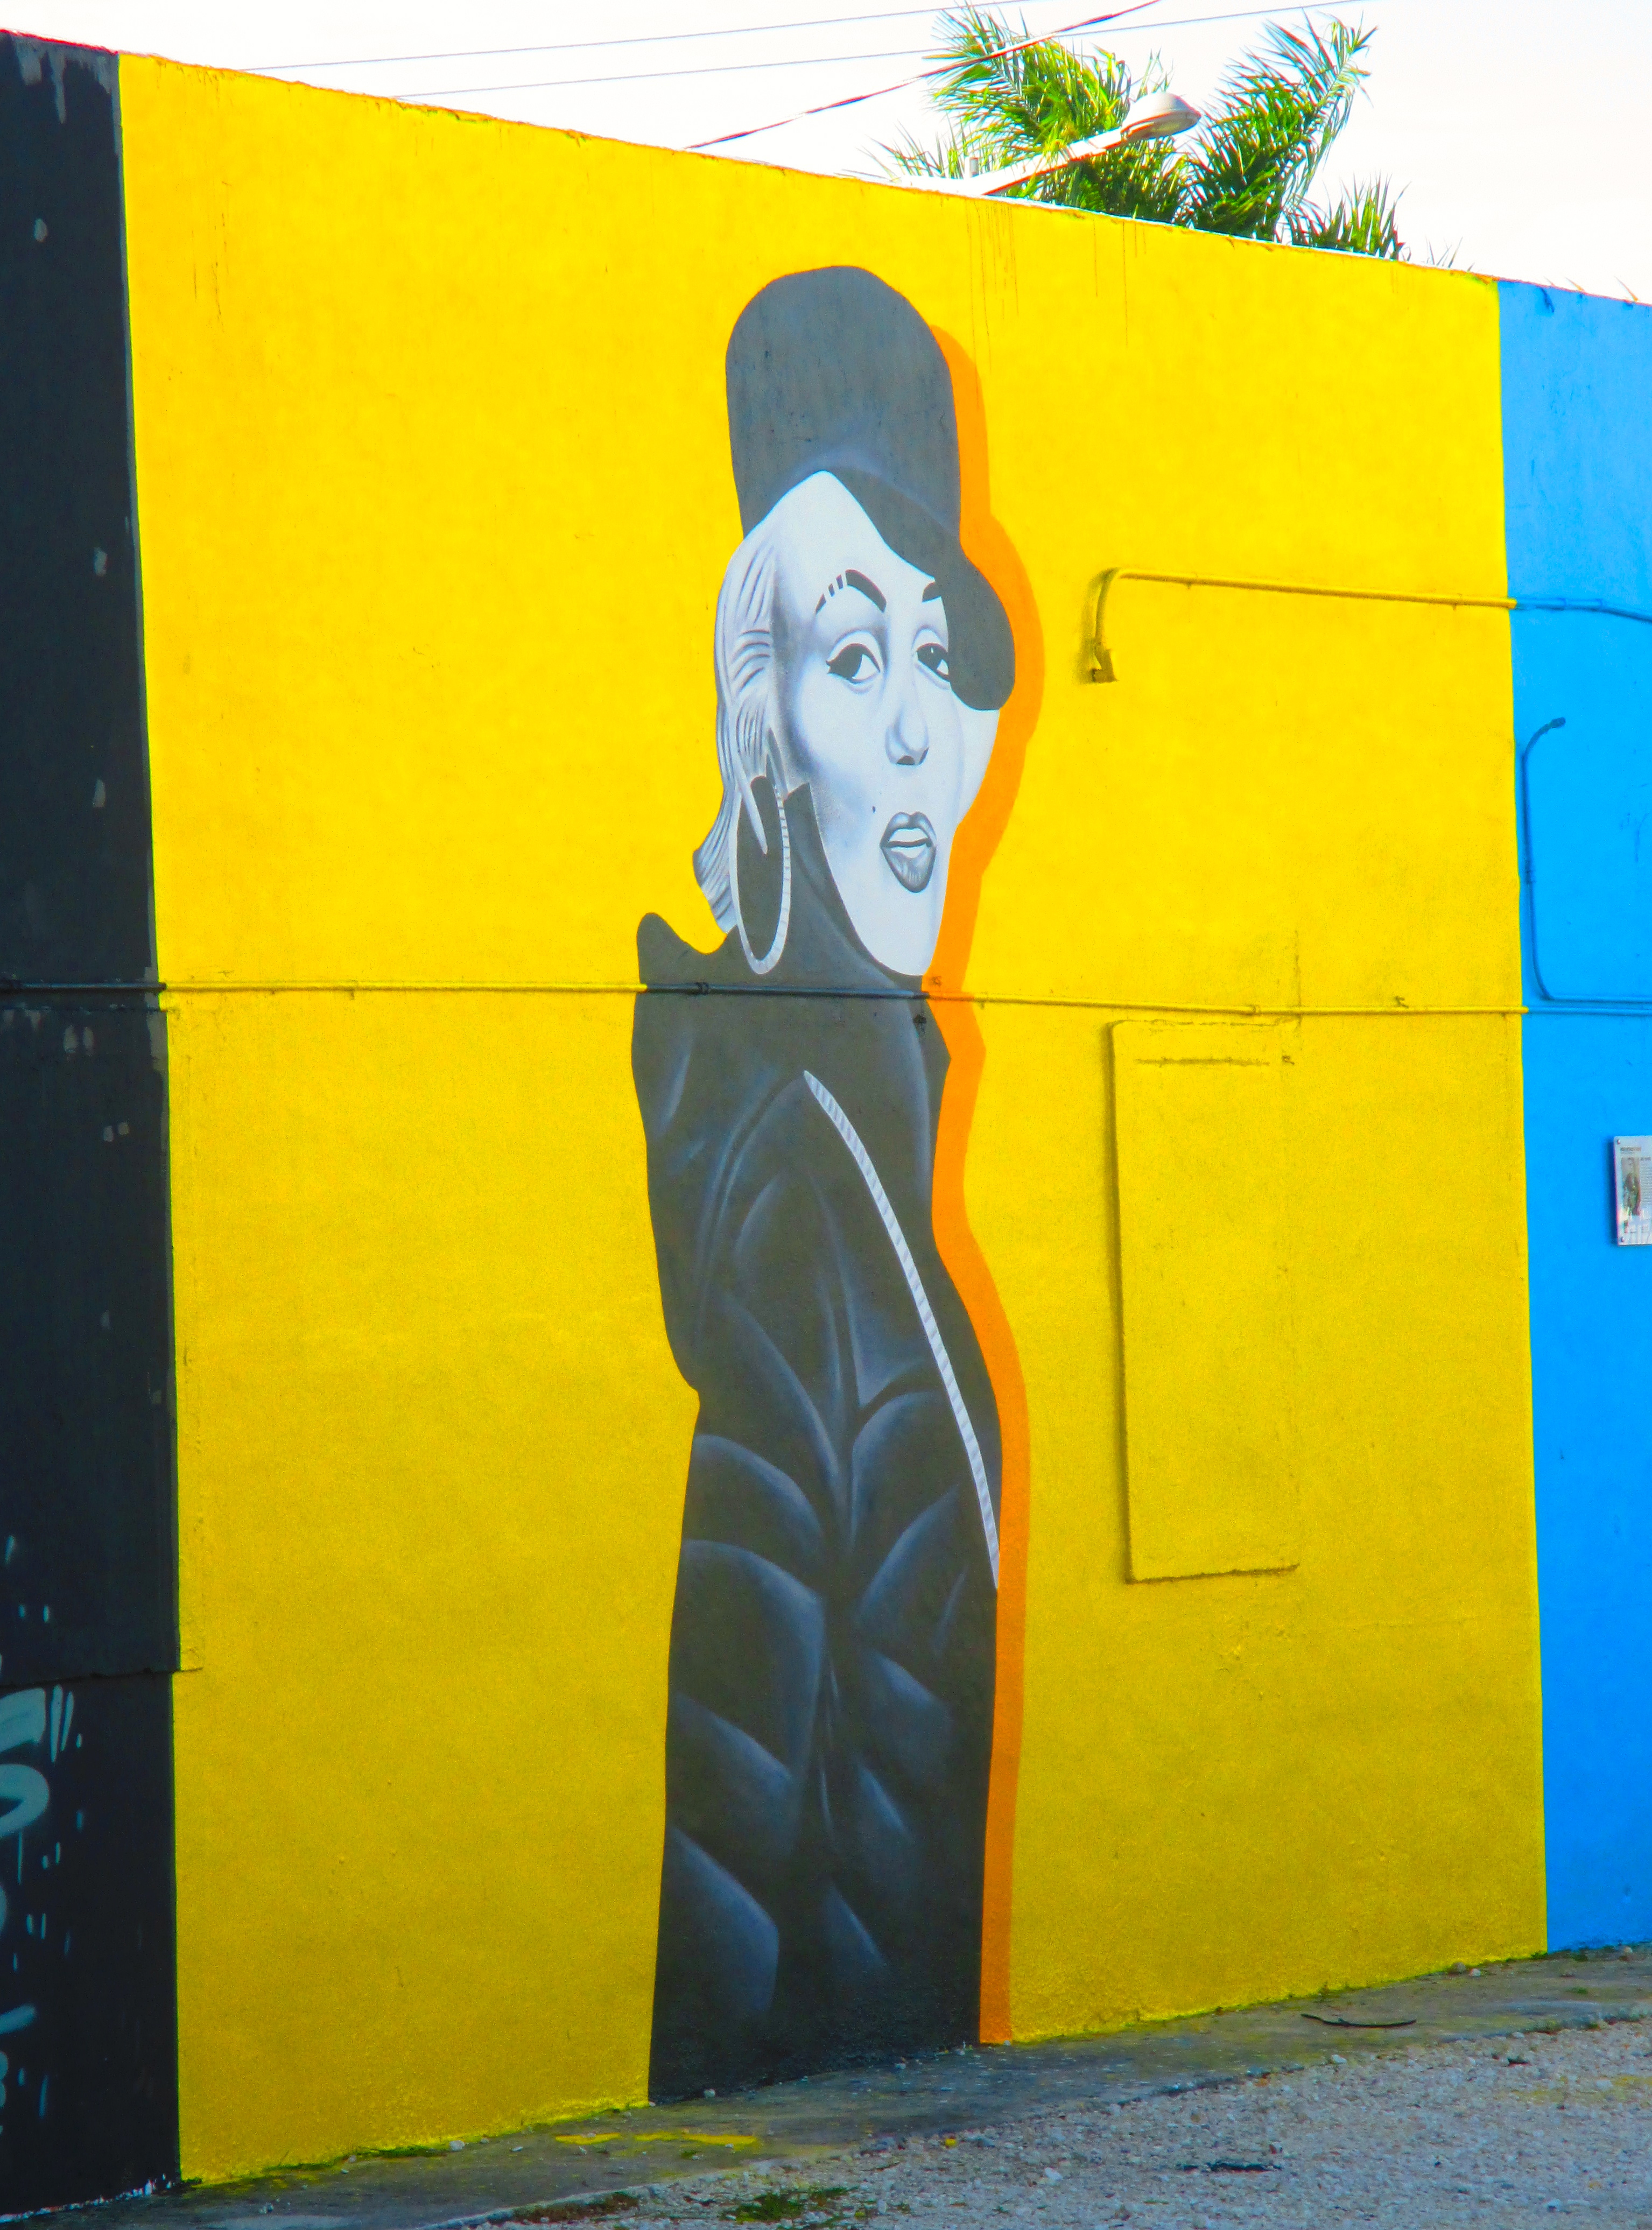 Road Trip! Wynwood Walls Miami! | ALI ROUND THE WORLD